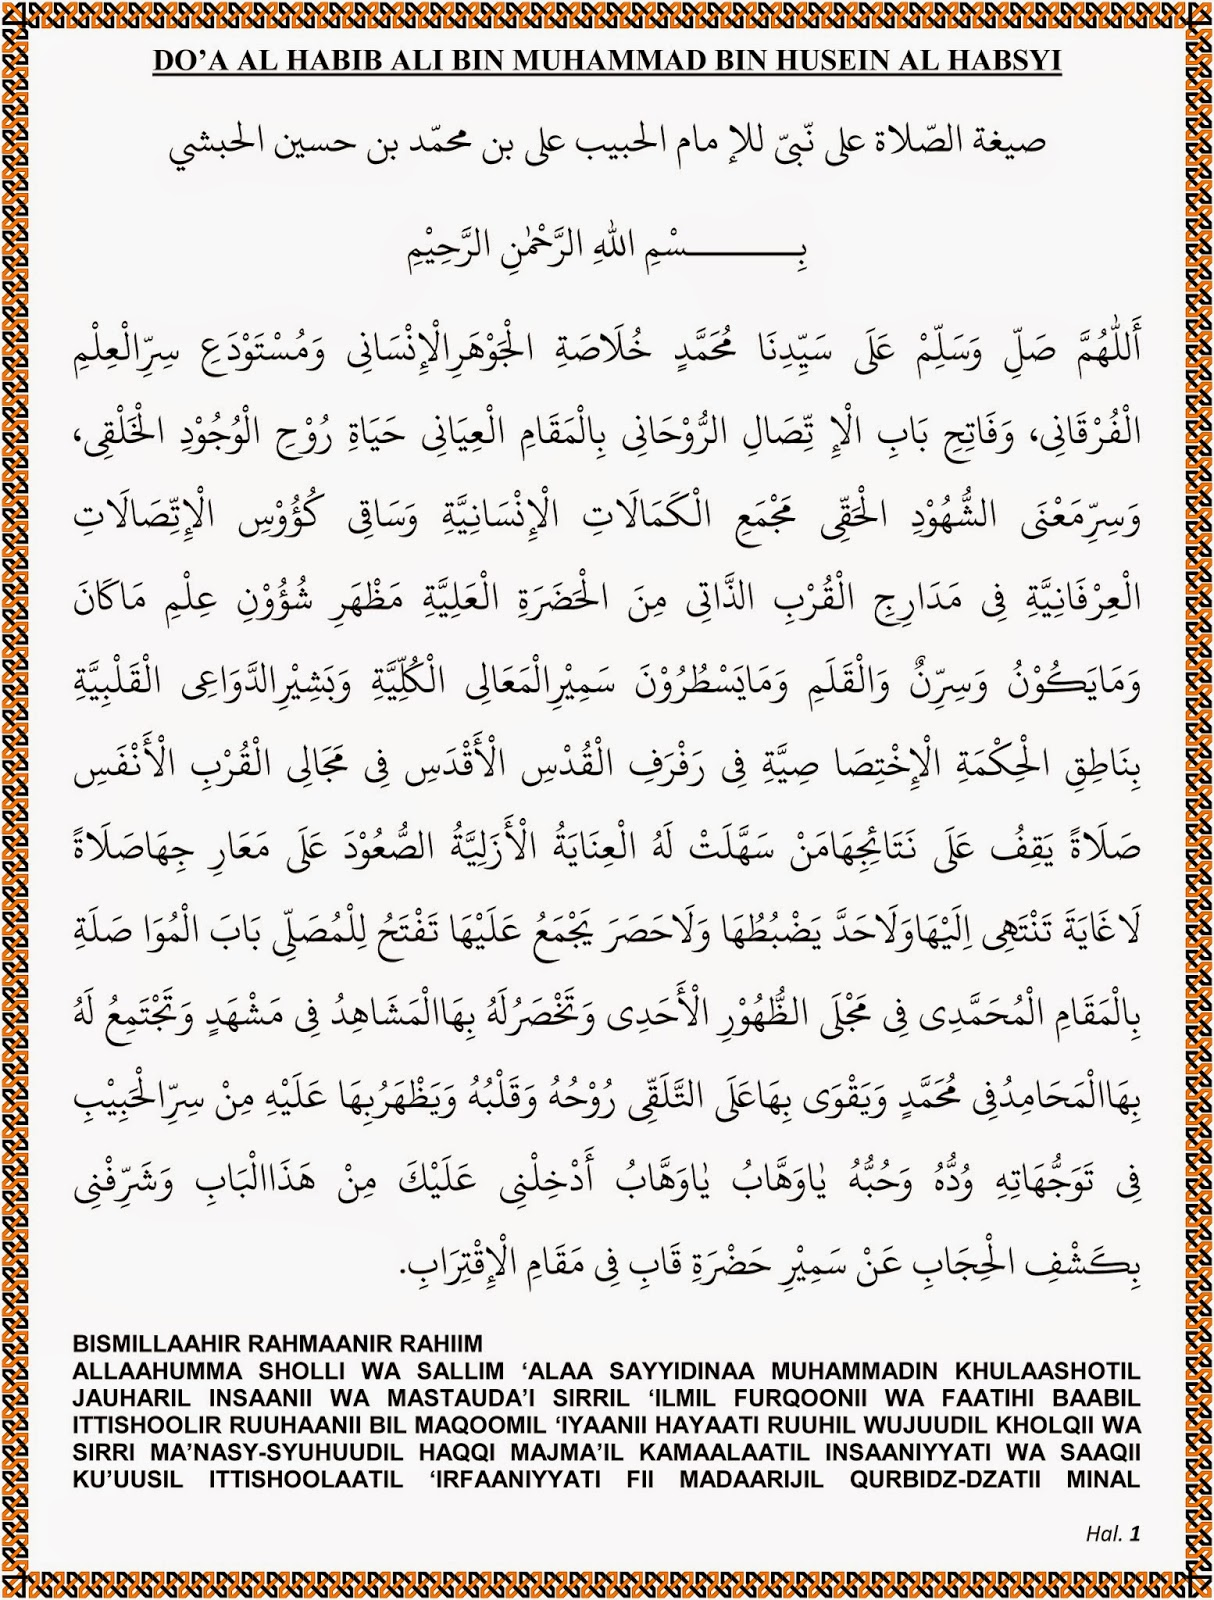 Doa Al Habib Ali Bin Muhammad Bin Husein Al Habsyi Majelis Talim